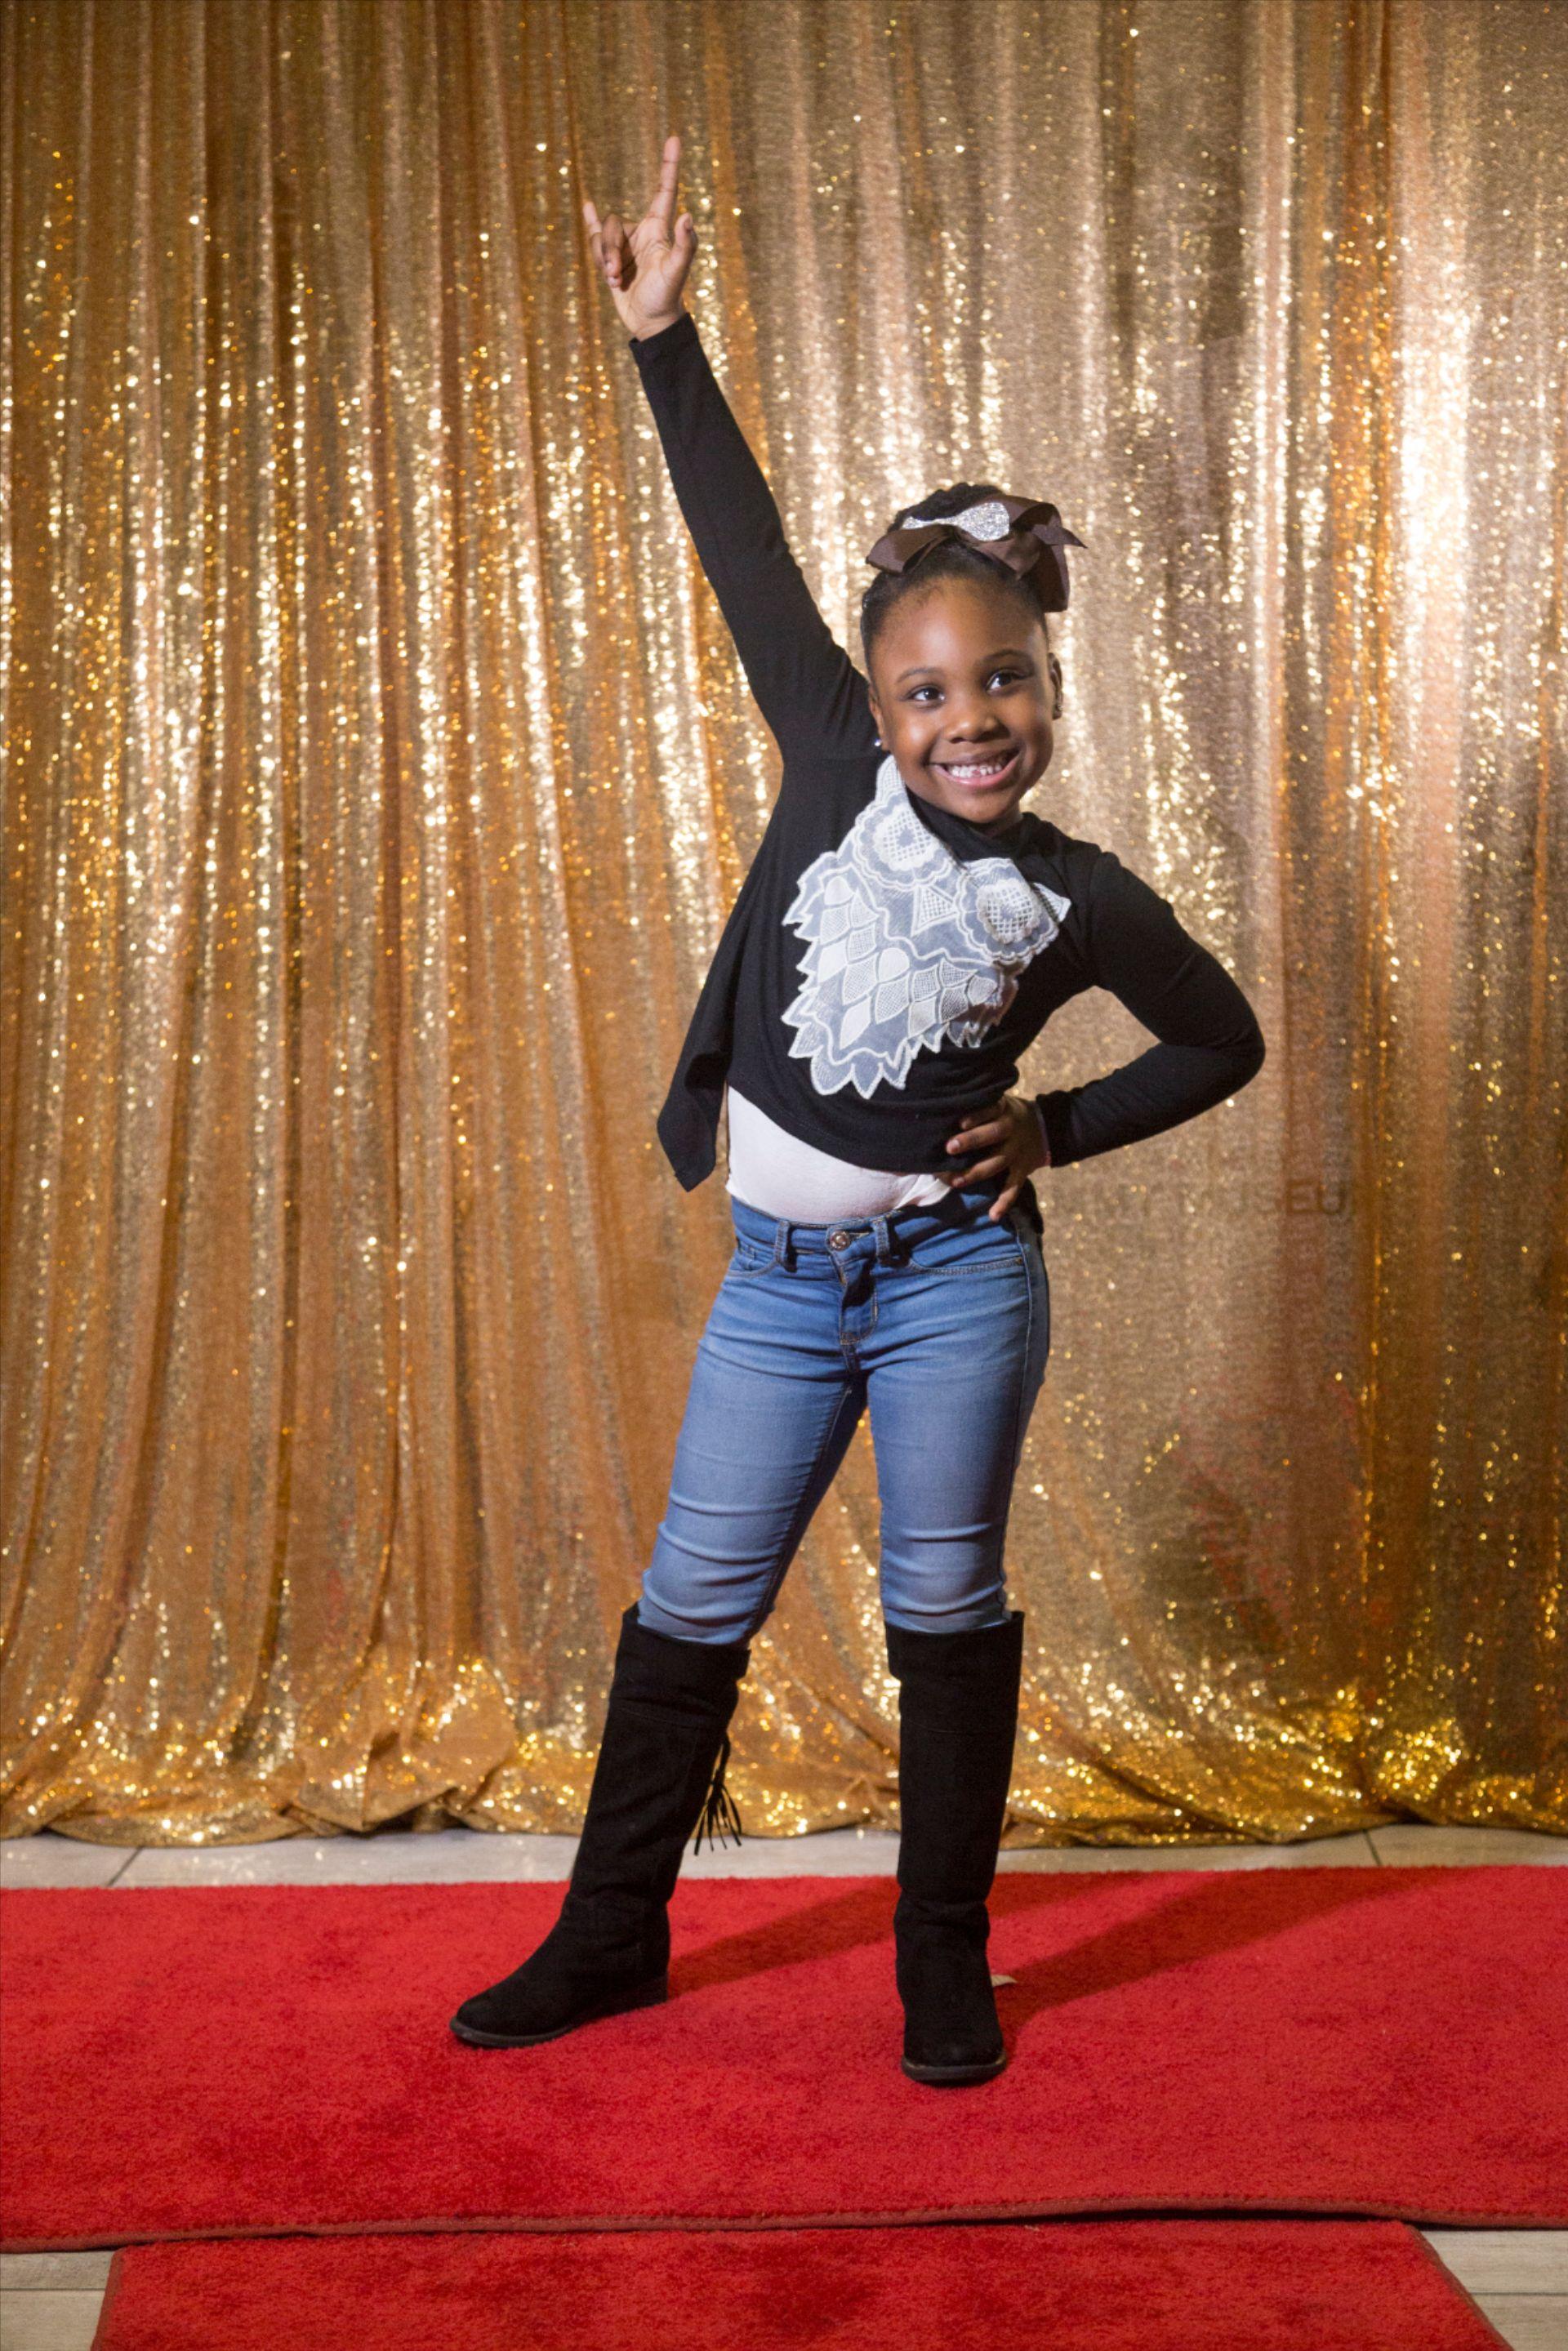 Kids Rock the Red Carpet_55A9993.jpg